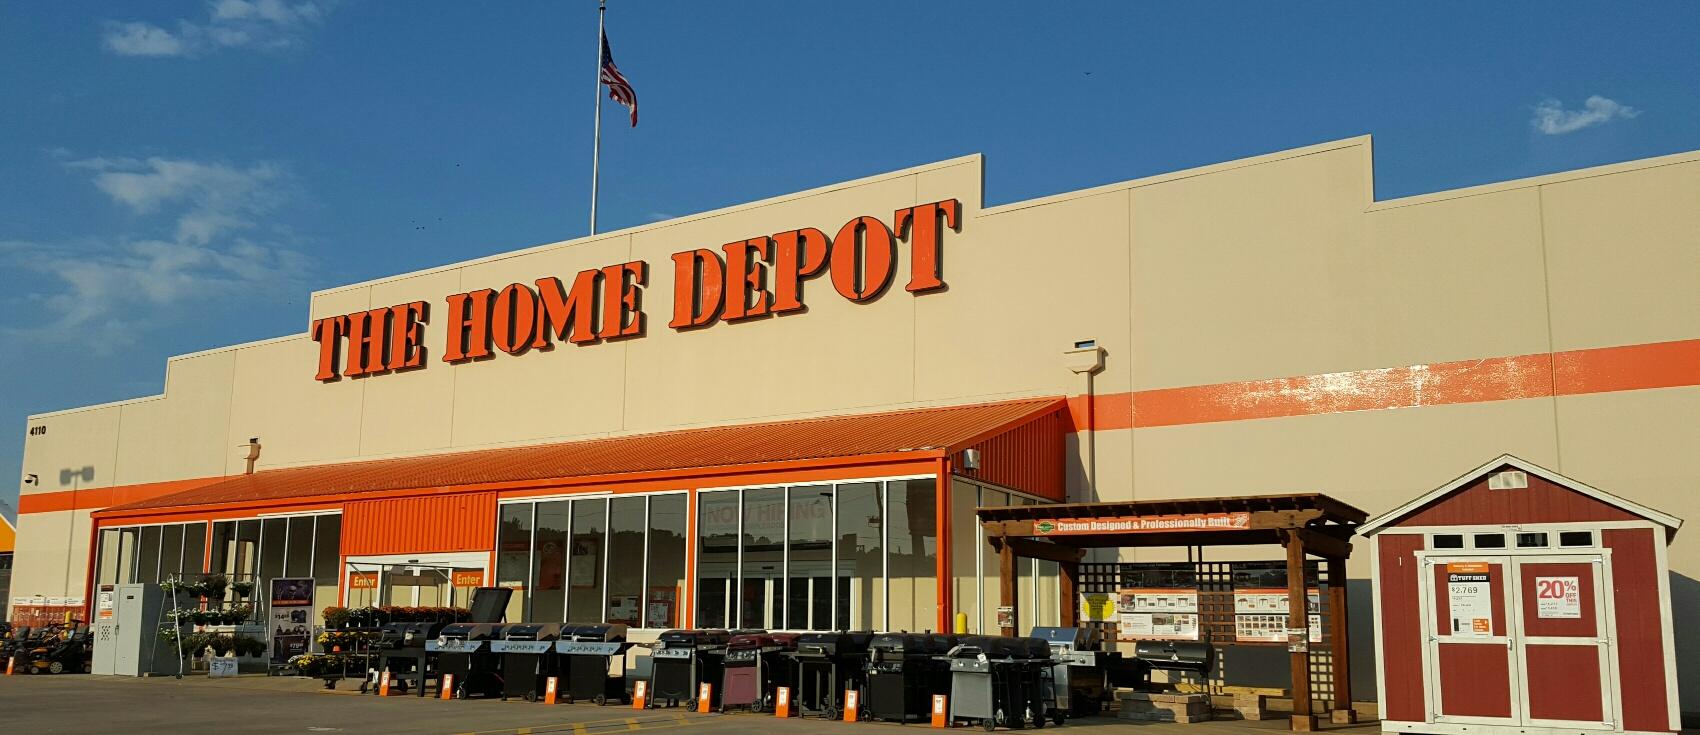 The Home Depot Texarkana Texas Tx Localdatabase Com